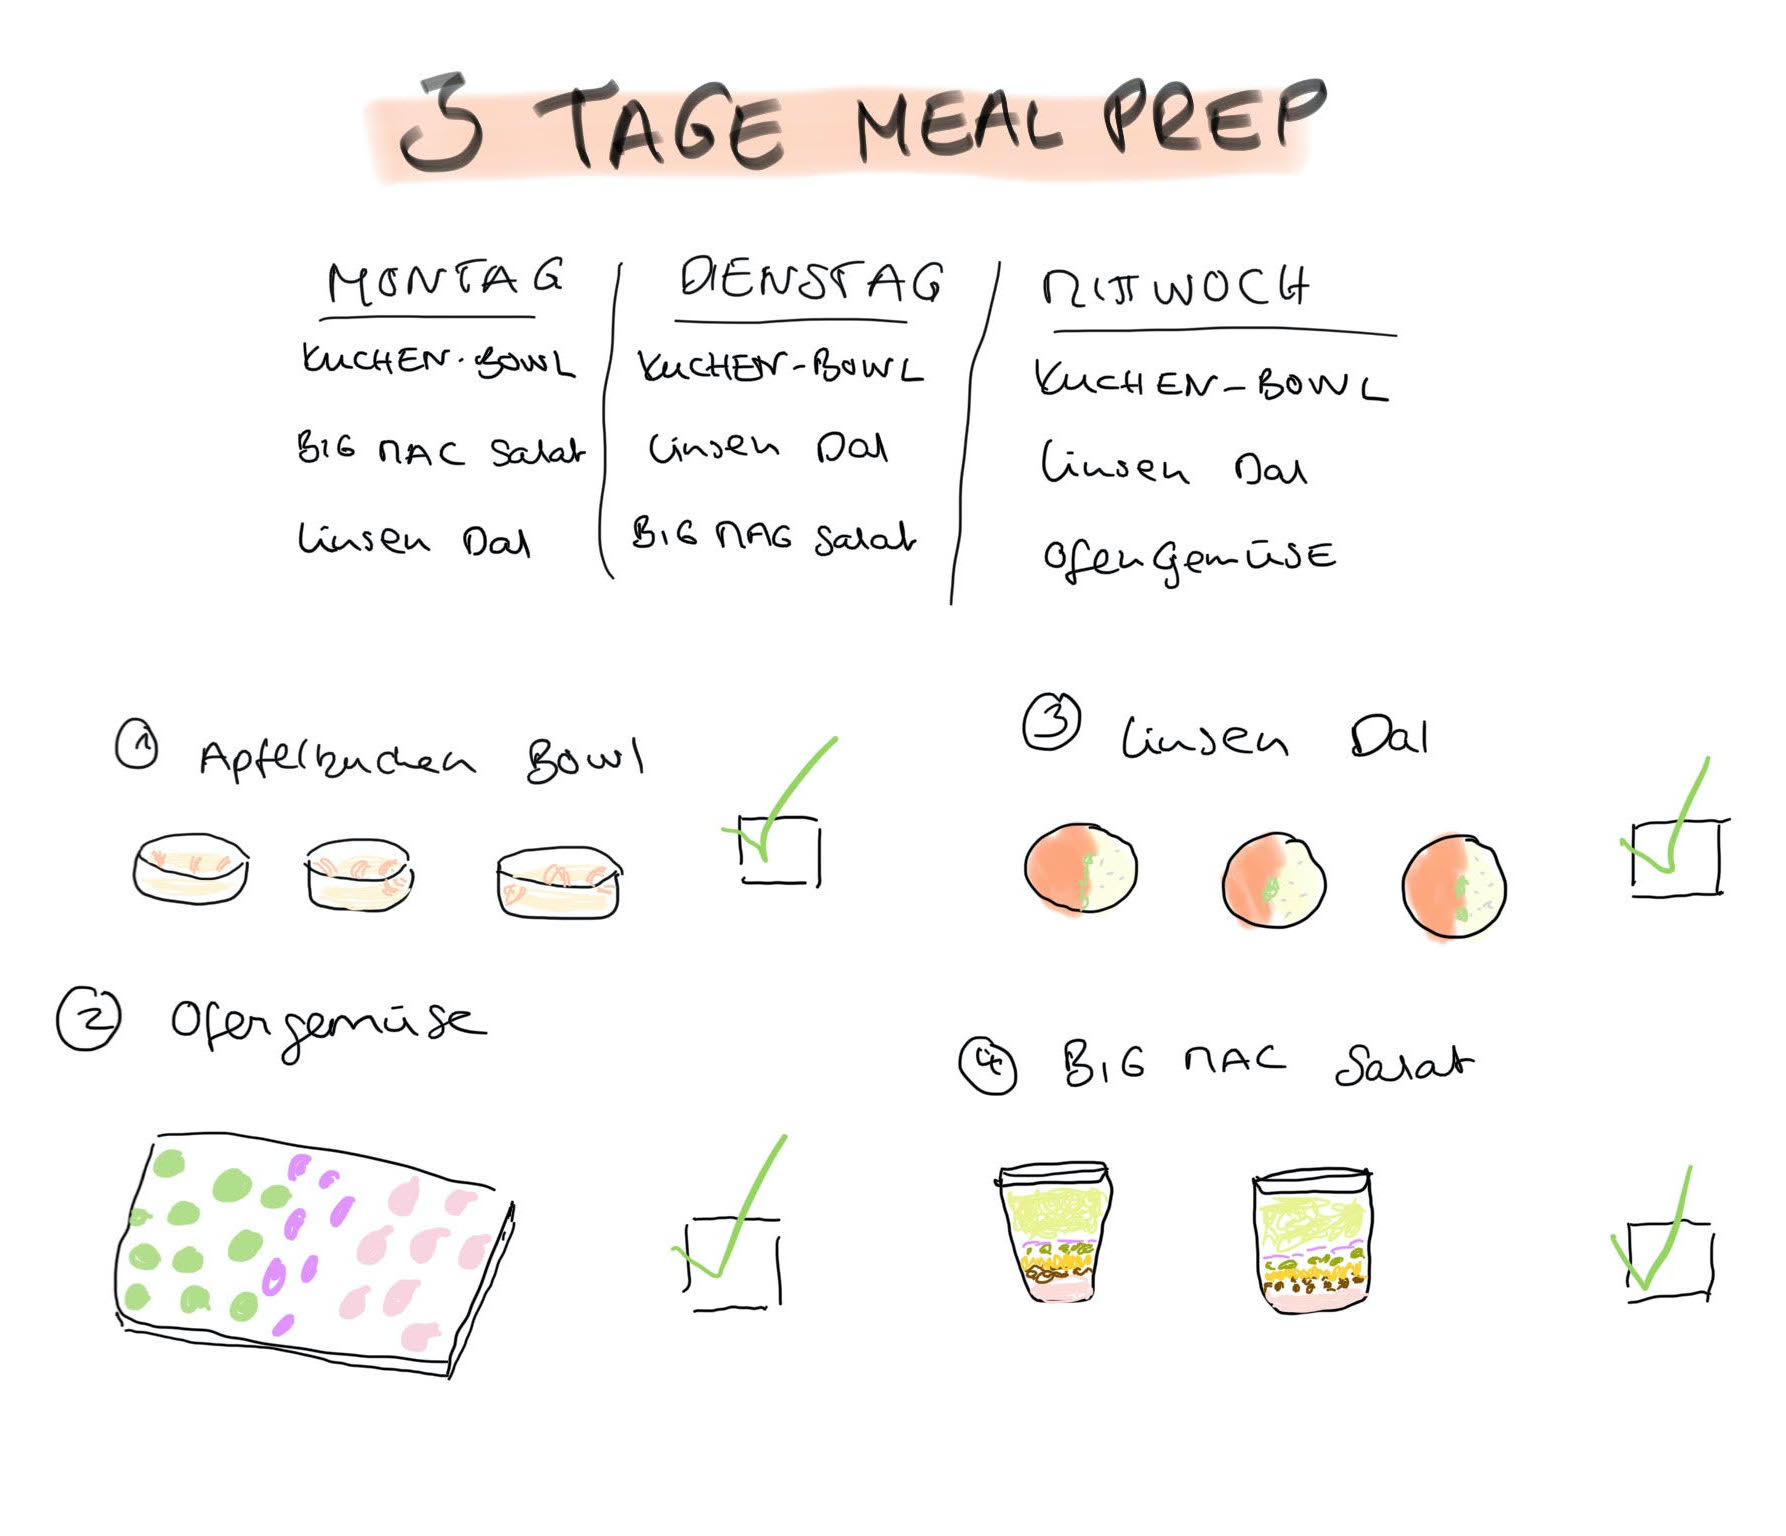 3 Tage Meal Prep Plan